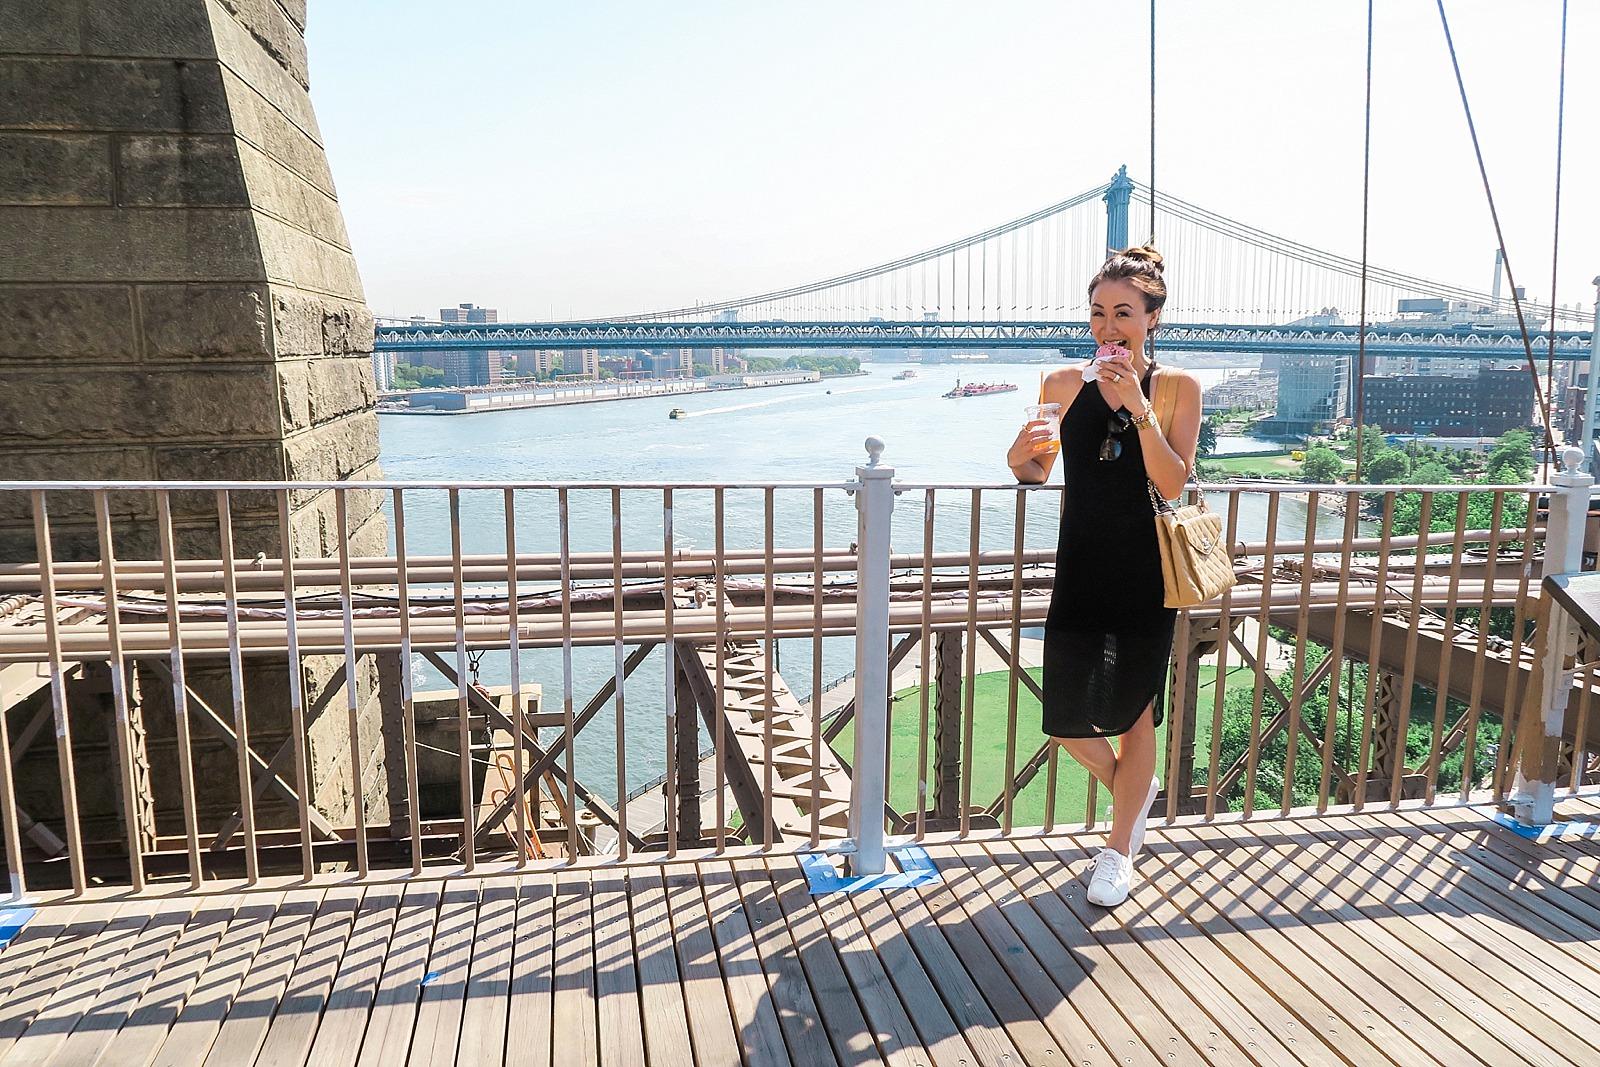 diana-elizabeth-steffen-phoenix-blogger-travel-new-york-brooklyn_0055